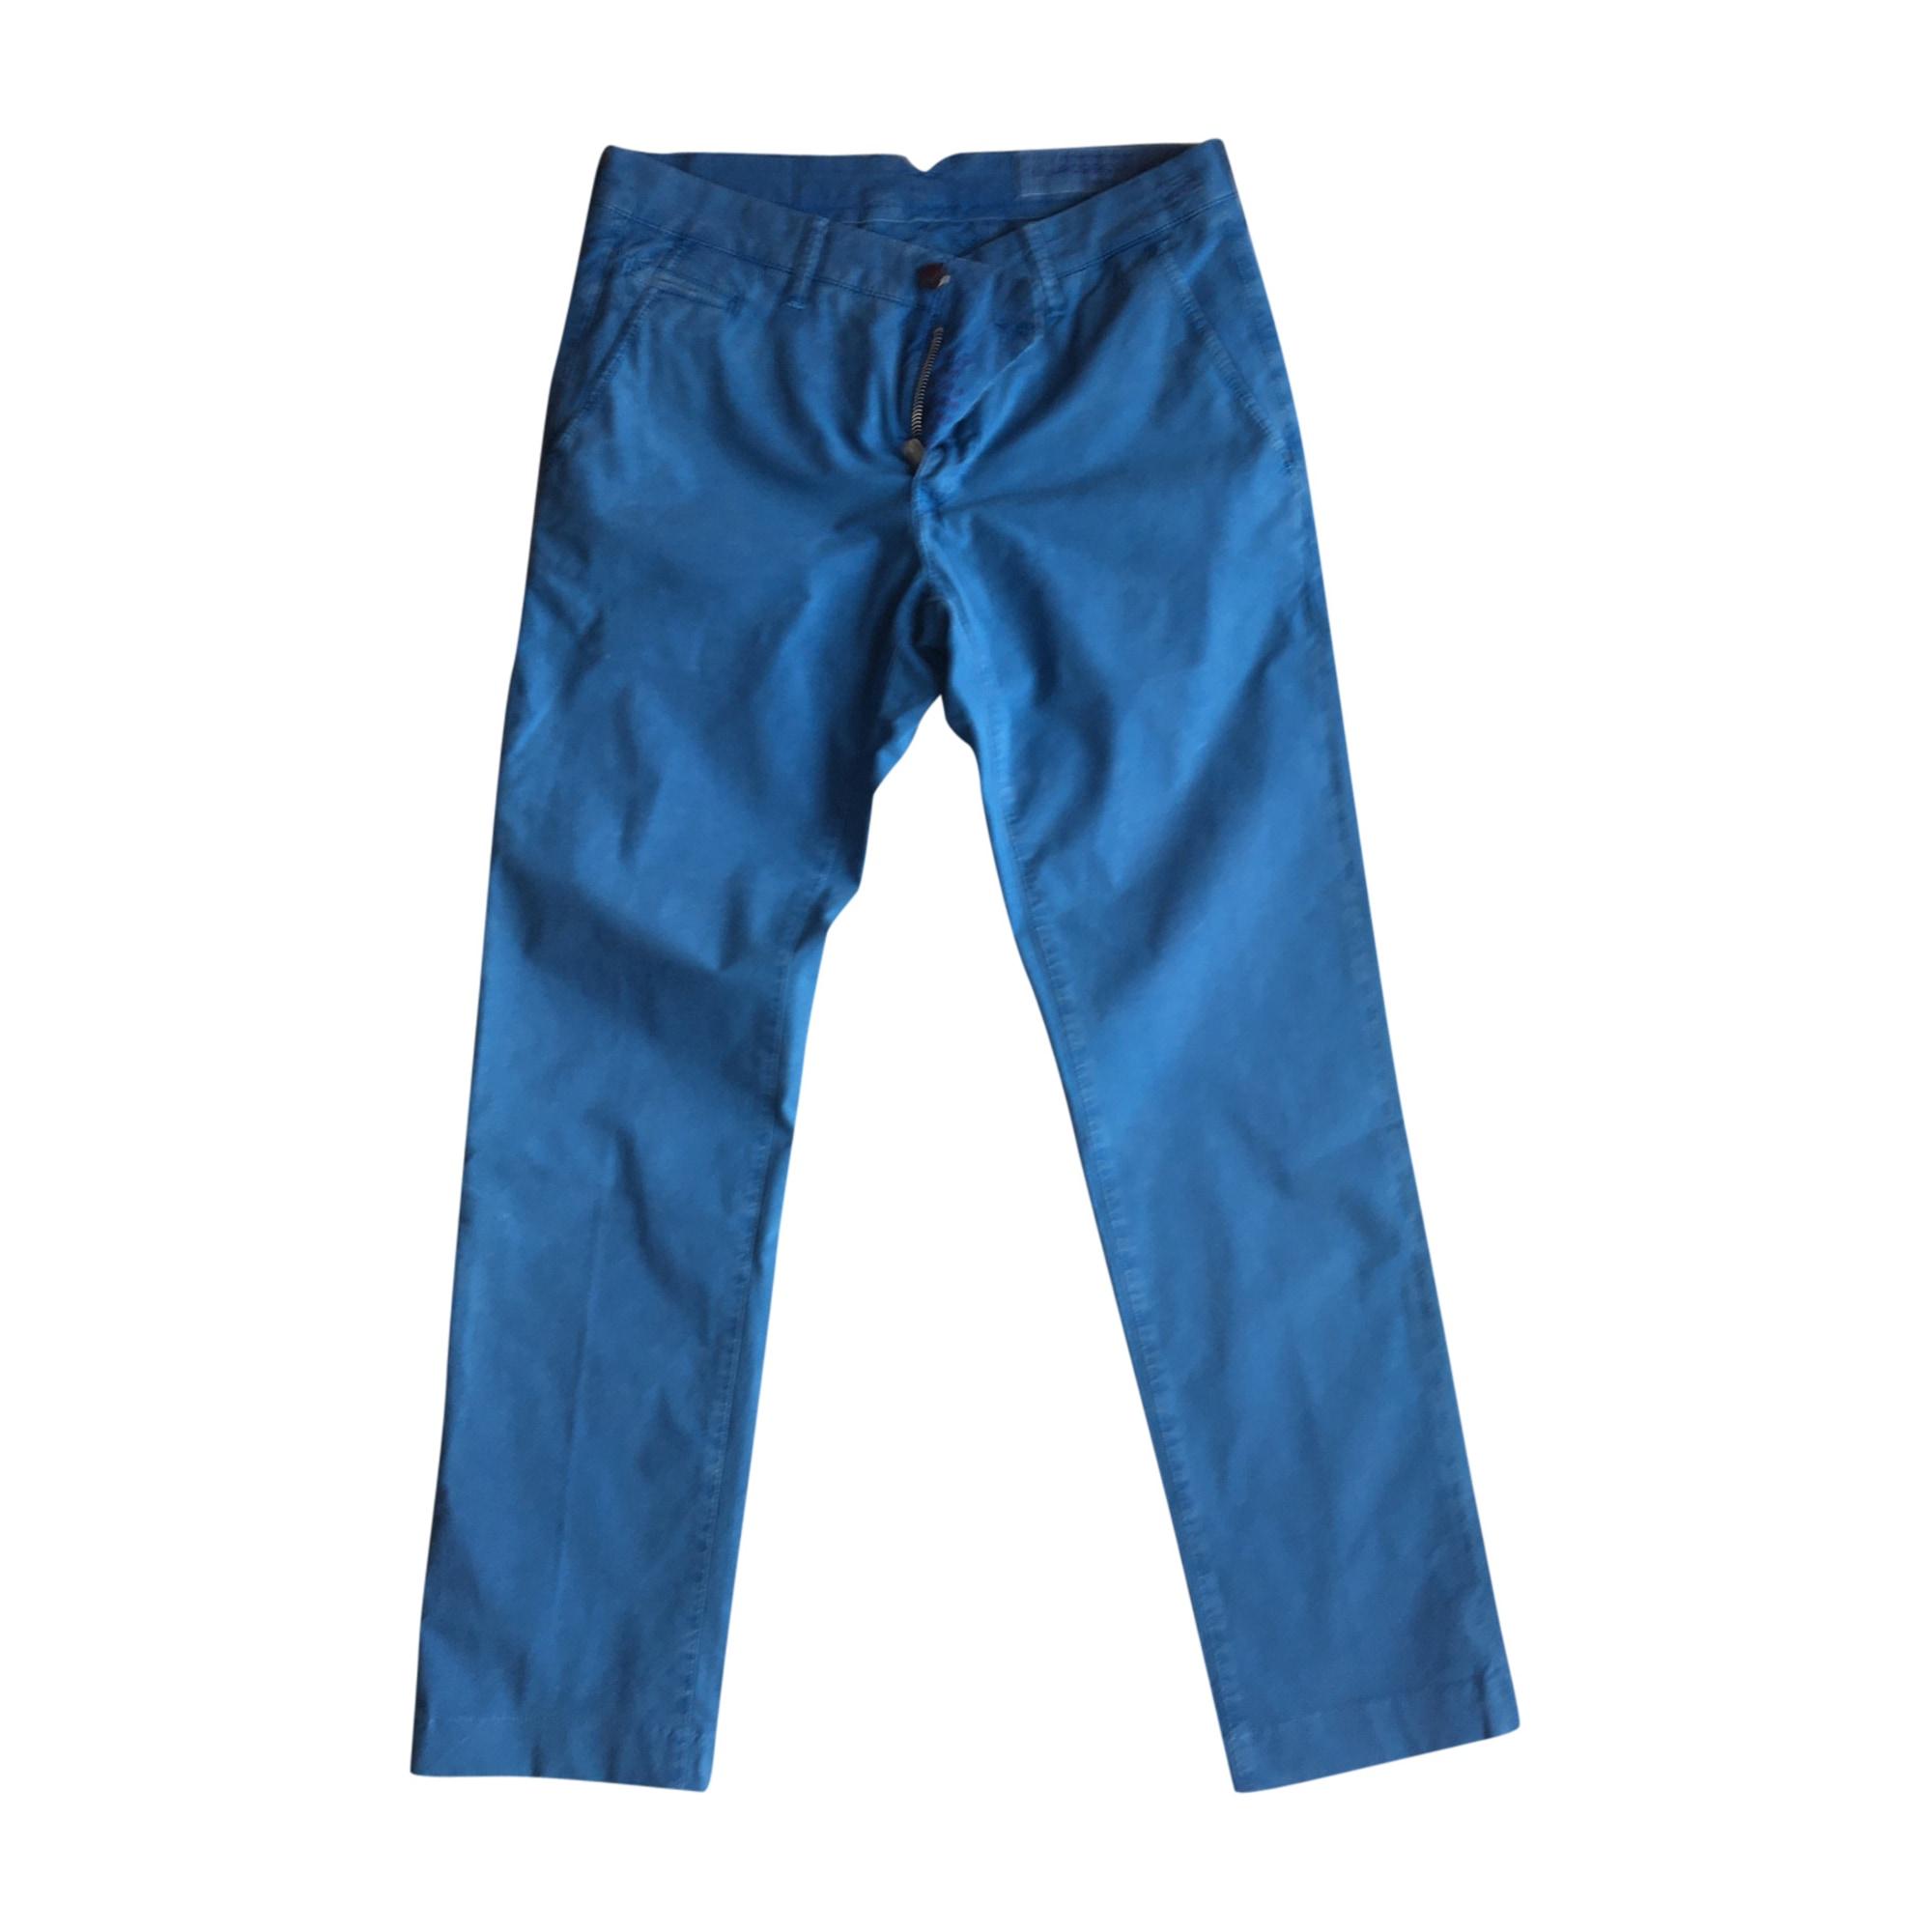 Pantalon droit JACOB COHEN Bleu, bleu marine, bleu turquoise